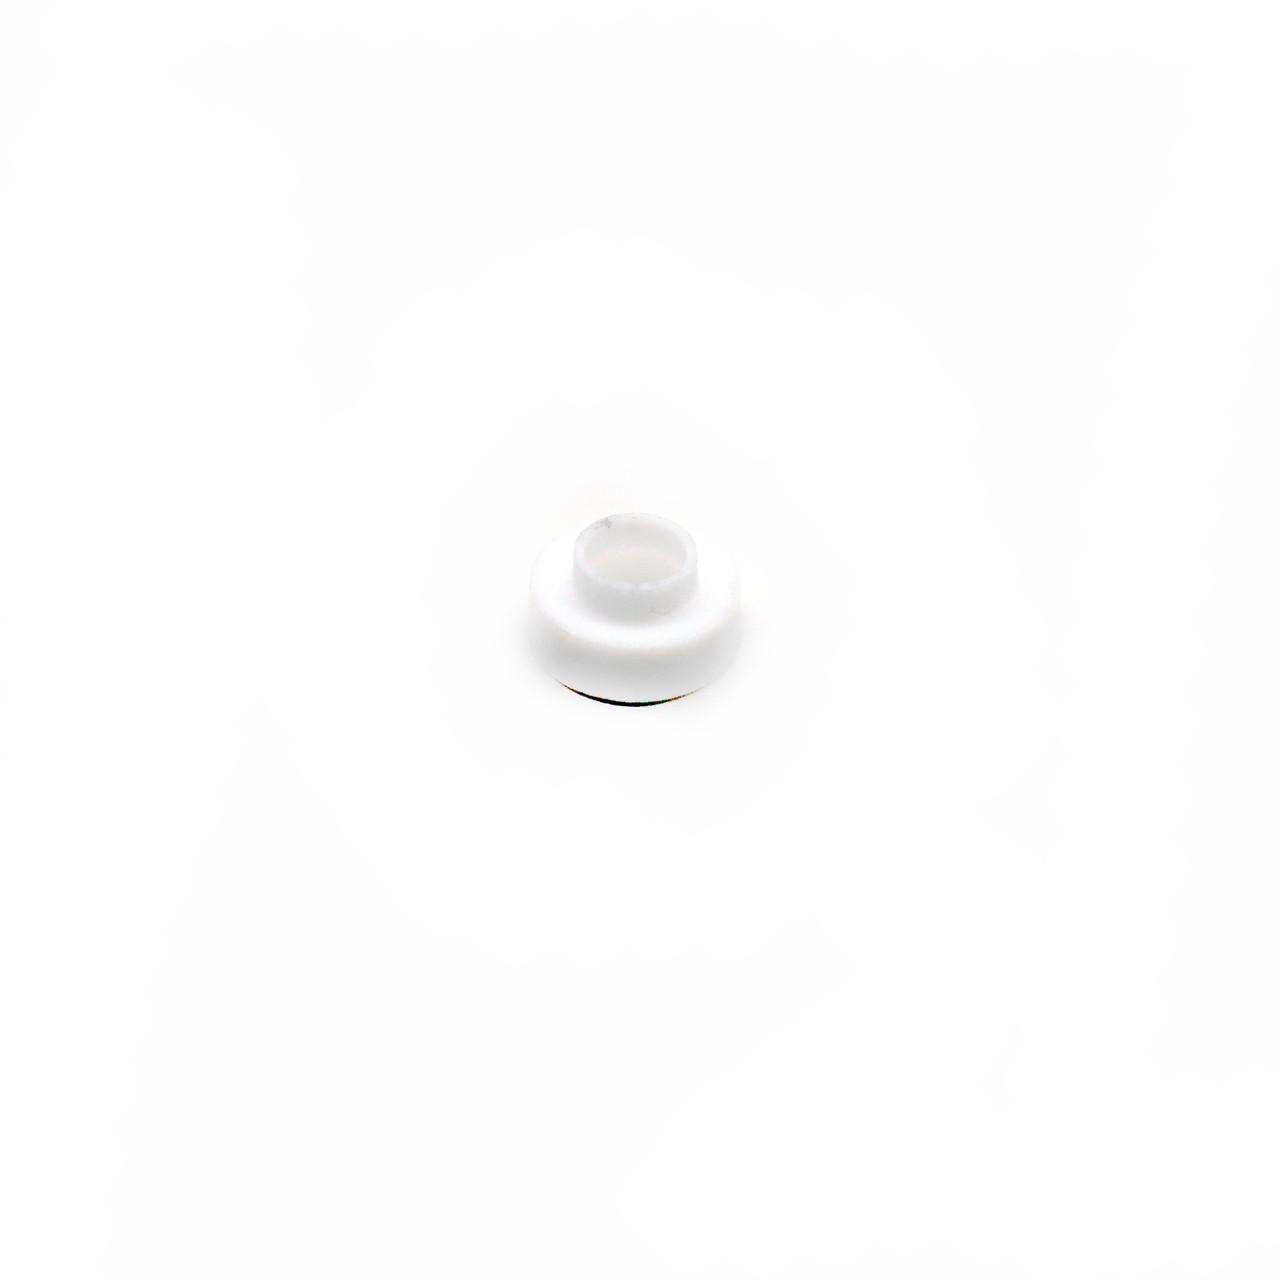 Фиксатор нагревателя воздуха впускного коллектора Cummins ISF 2.8 E4 5305257